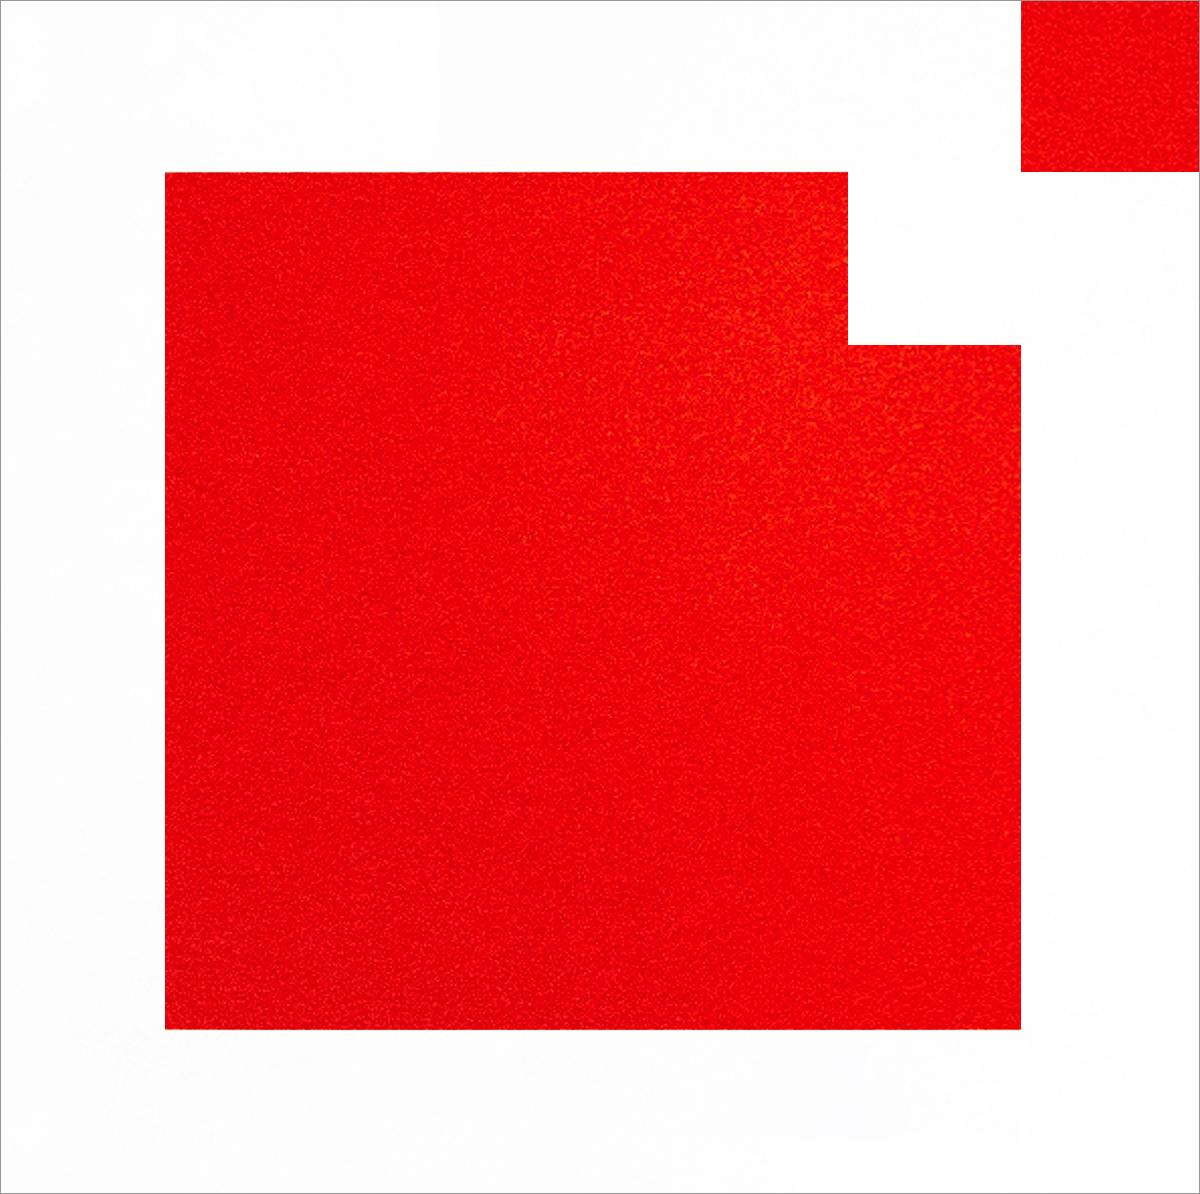 Peinture Minimal Space – 50x50 / Peinture acrylique sur toile, vernis brillant